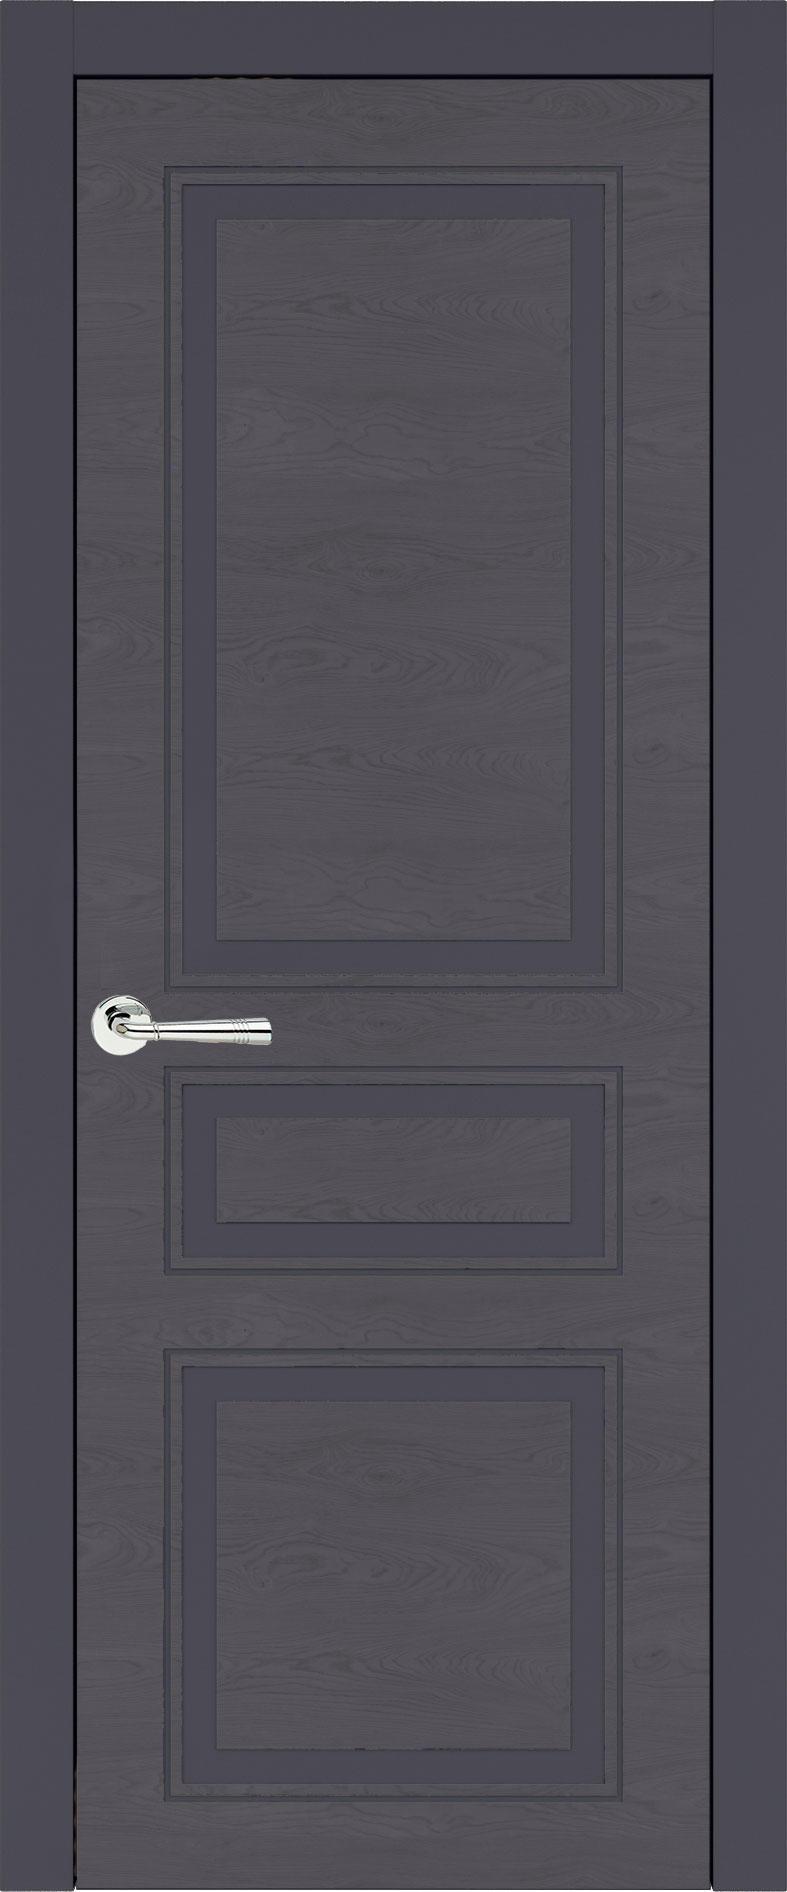 Imperia-R Neo Classic цвет - Графитово-серая эмаль по шпону (RAL 7024) Без стекла (ДГ)